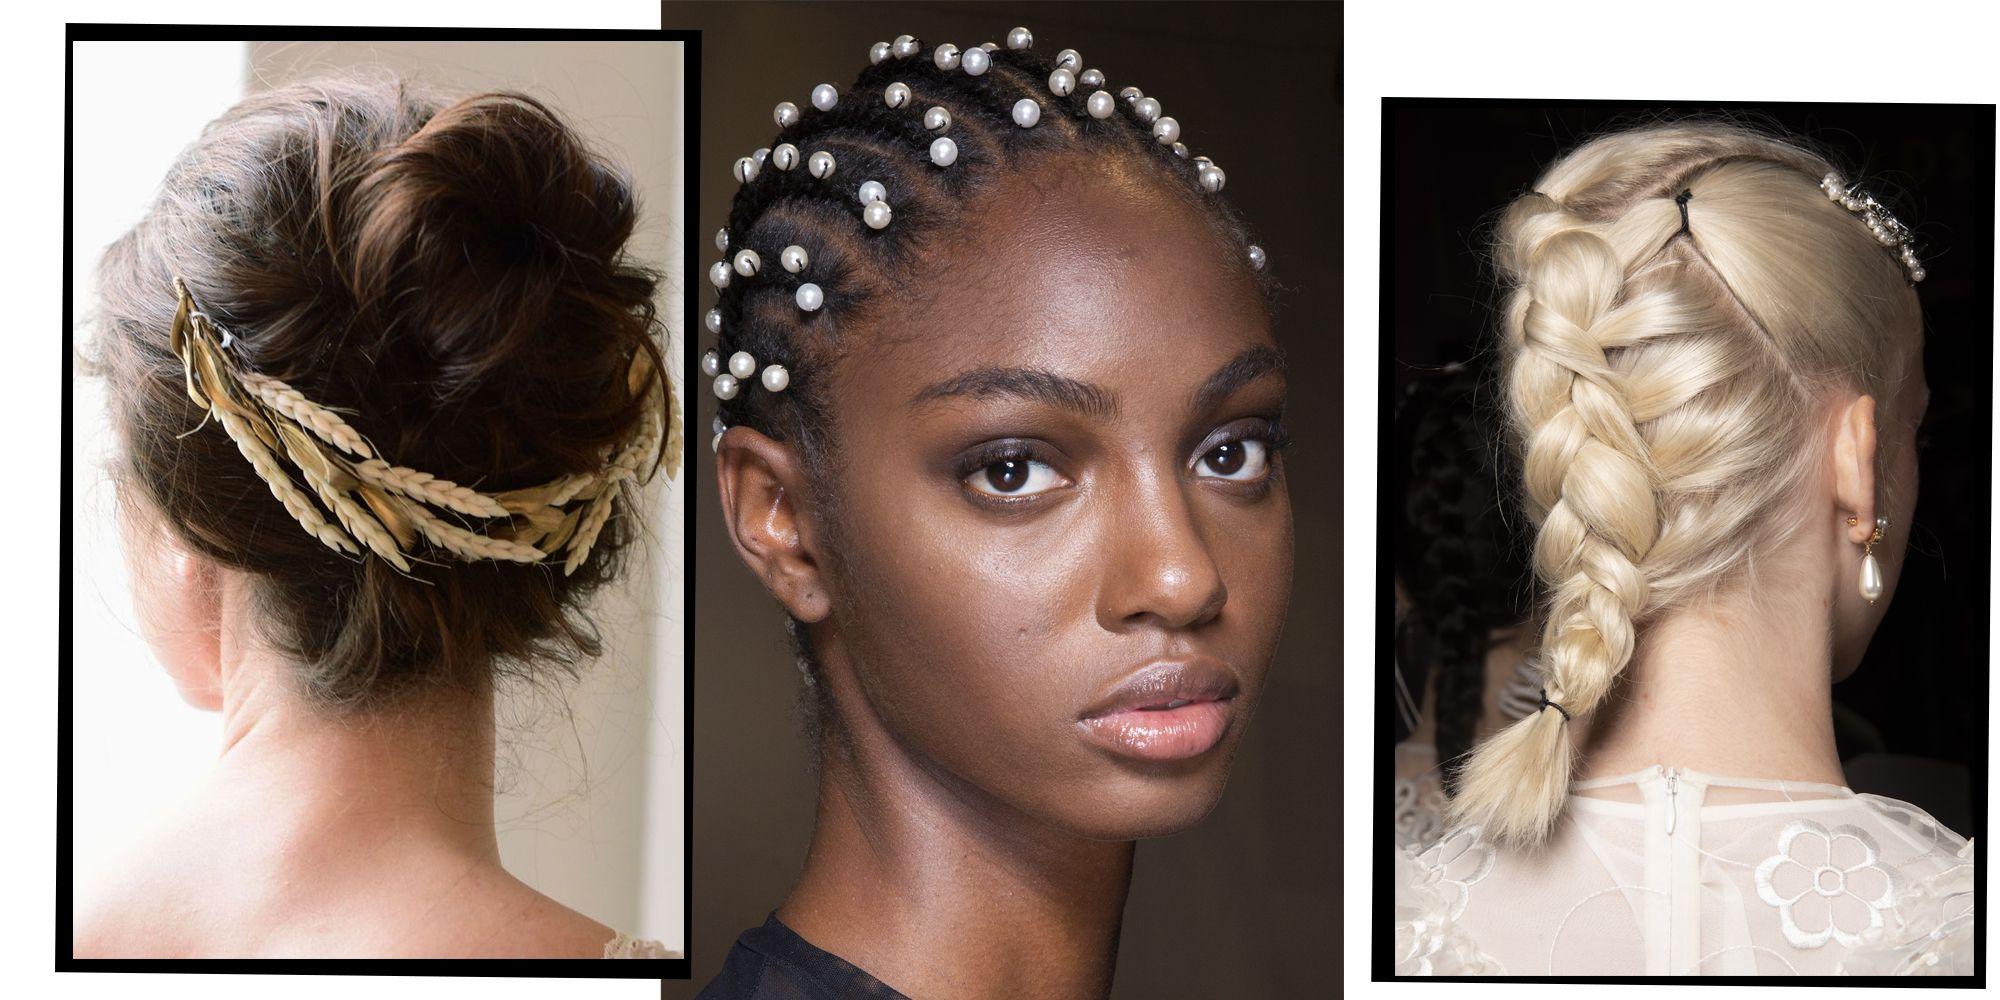 Wedding Hair Inspiration - Wedding Hairstyles for Brides & Bridesmaids